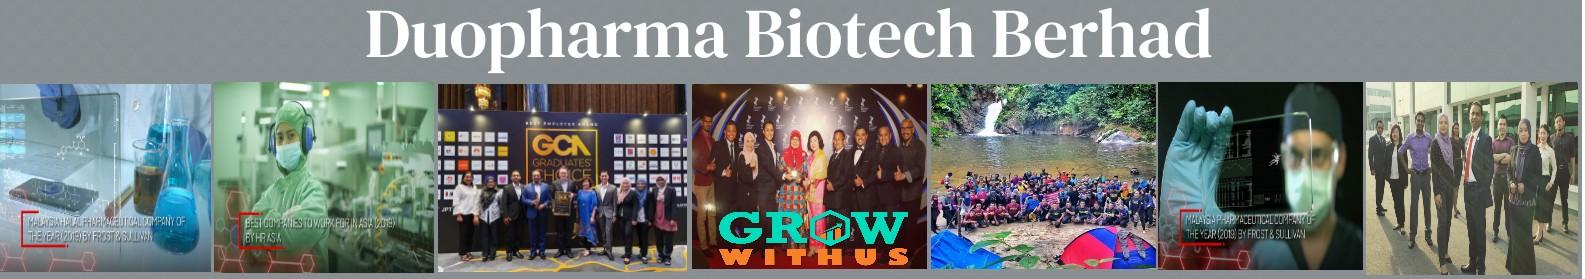 Duopharma Biotech Bhd Linkedin